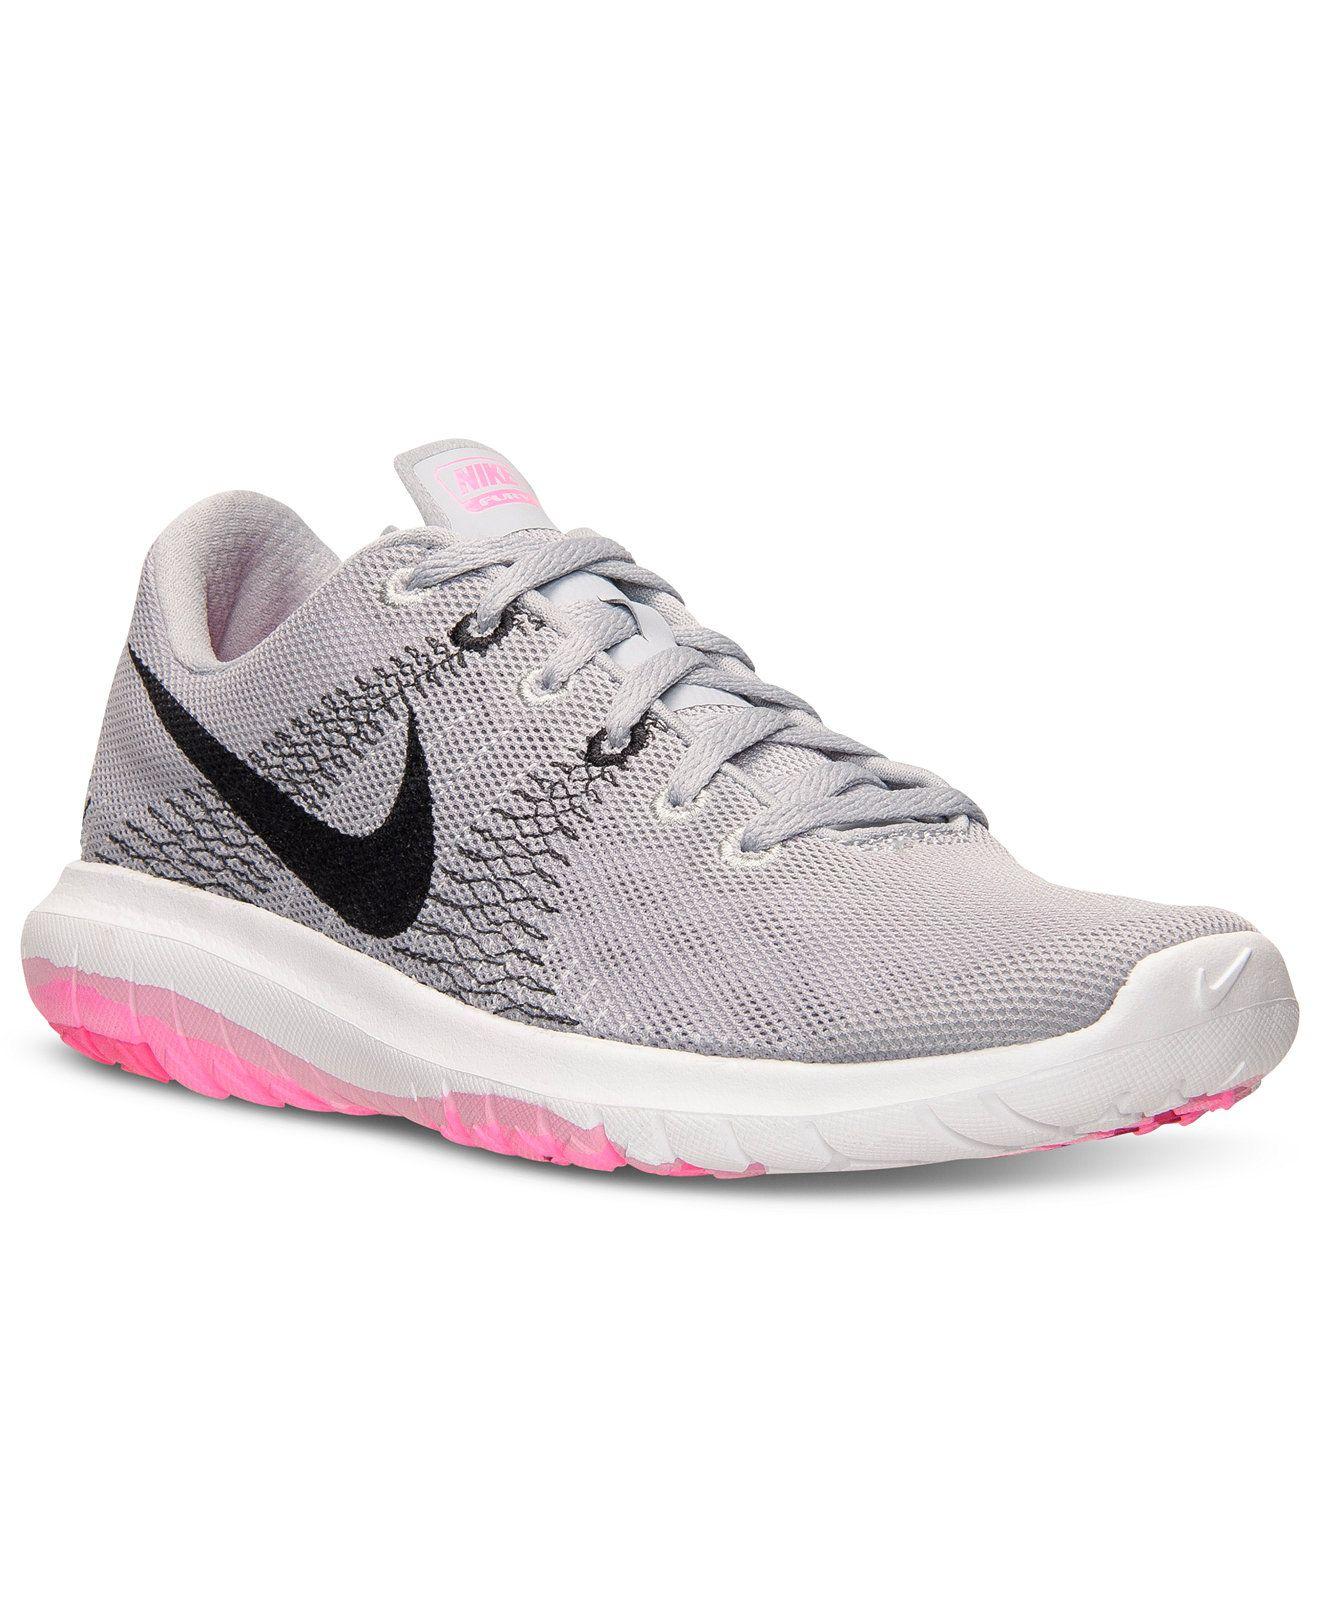 Nike Women's Flex Fury Running Sneakers from Finish Line